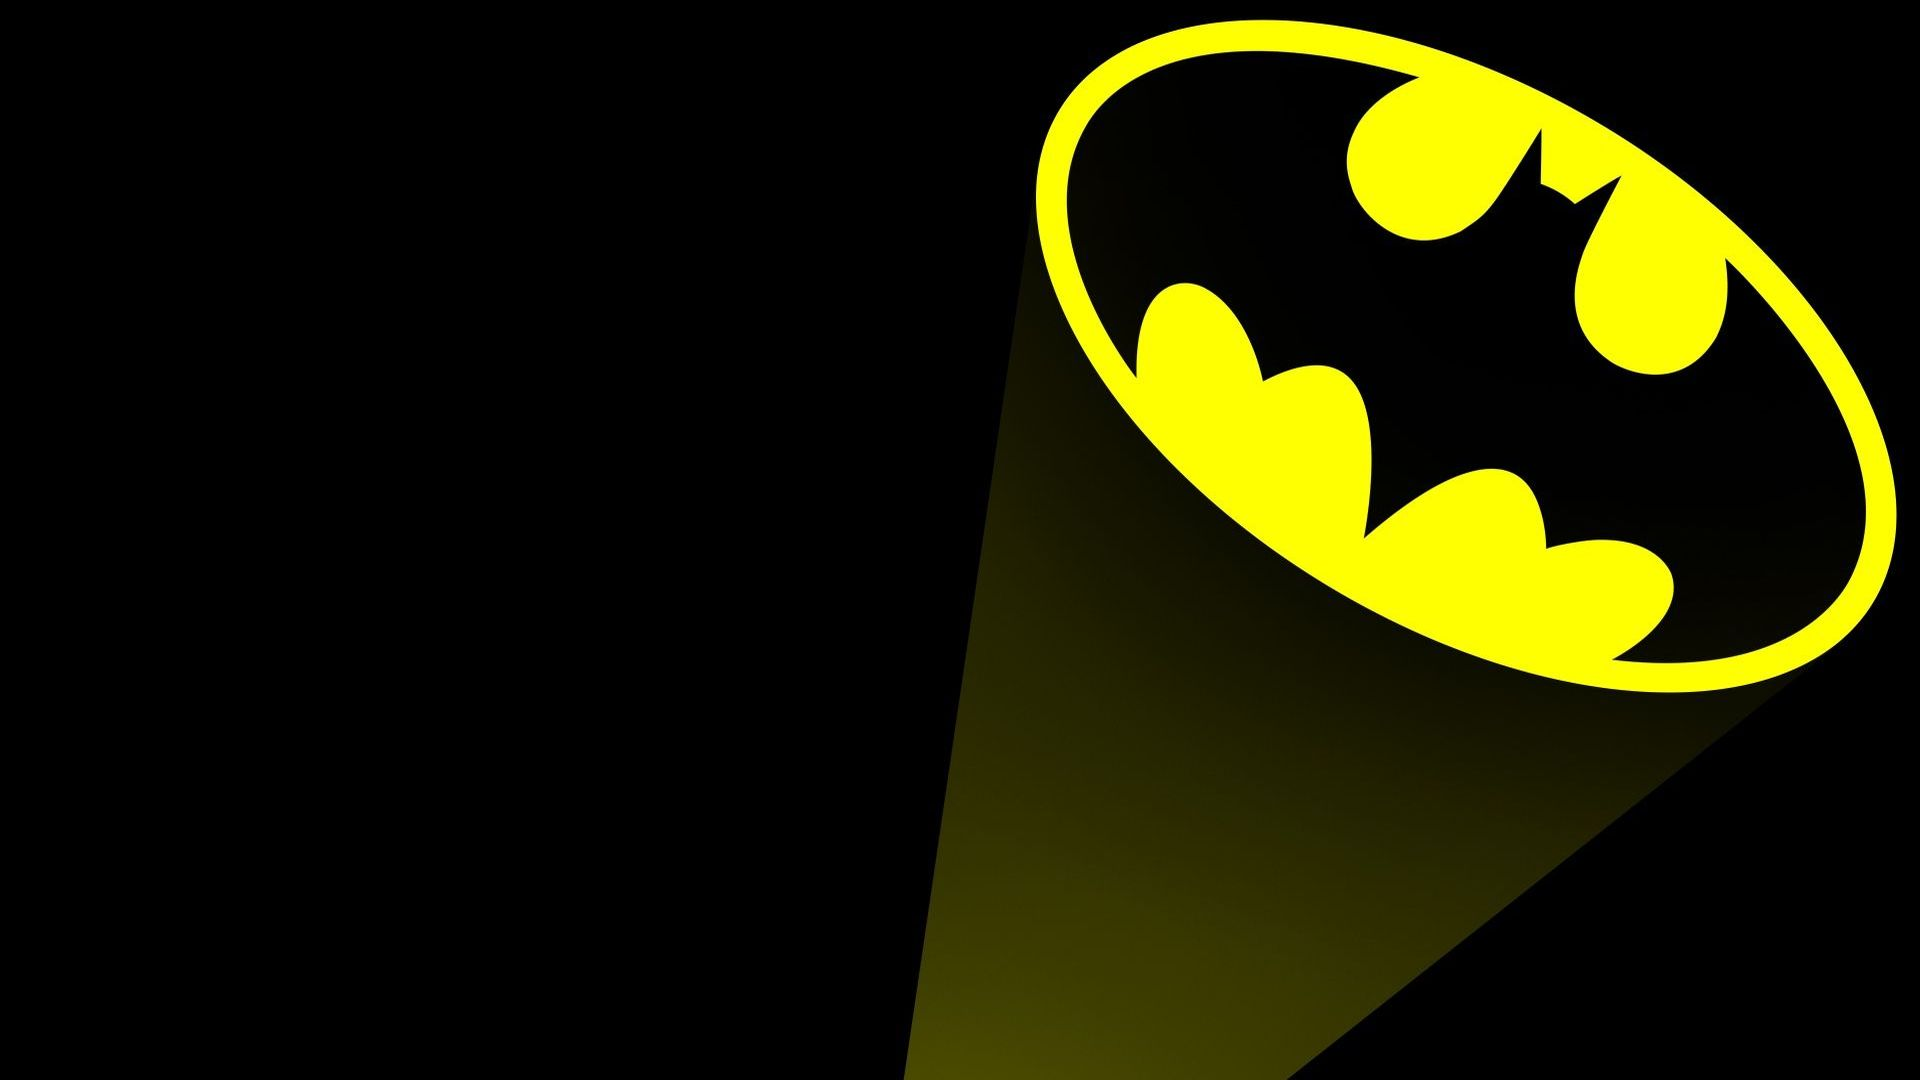 Herunterladen 1920x1080 Full HD Hintergrundbilder batman